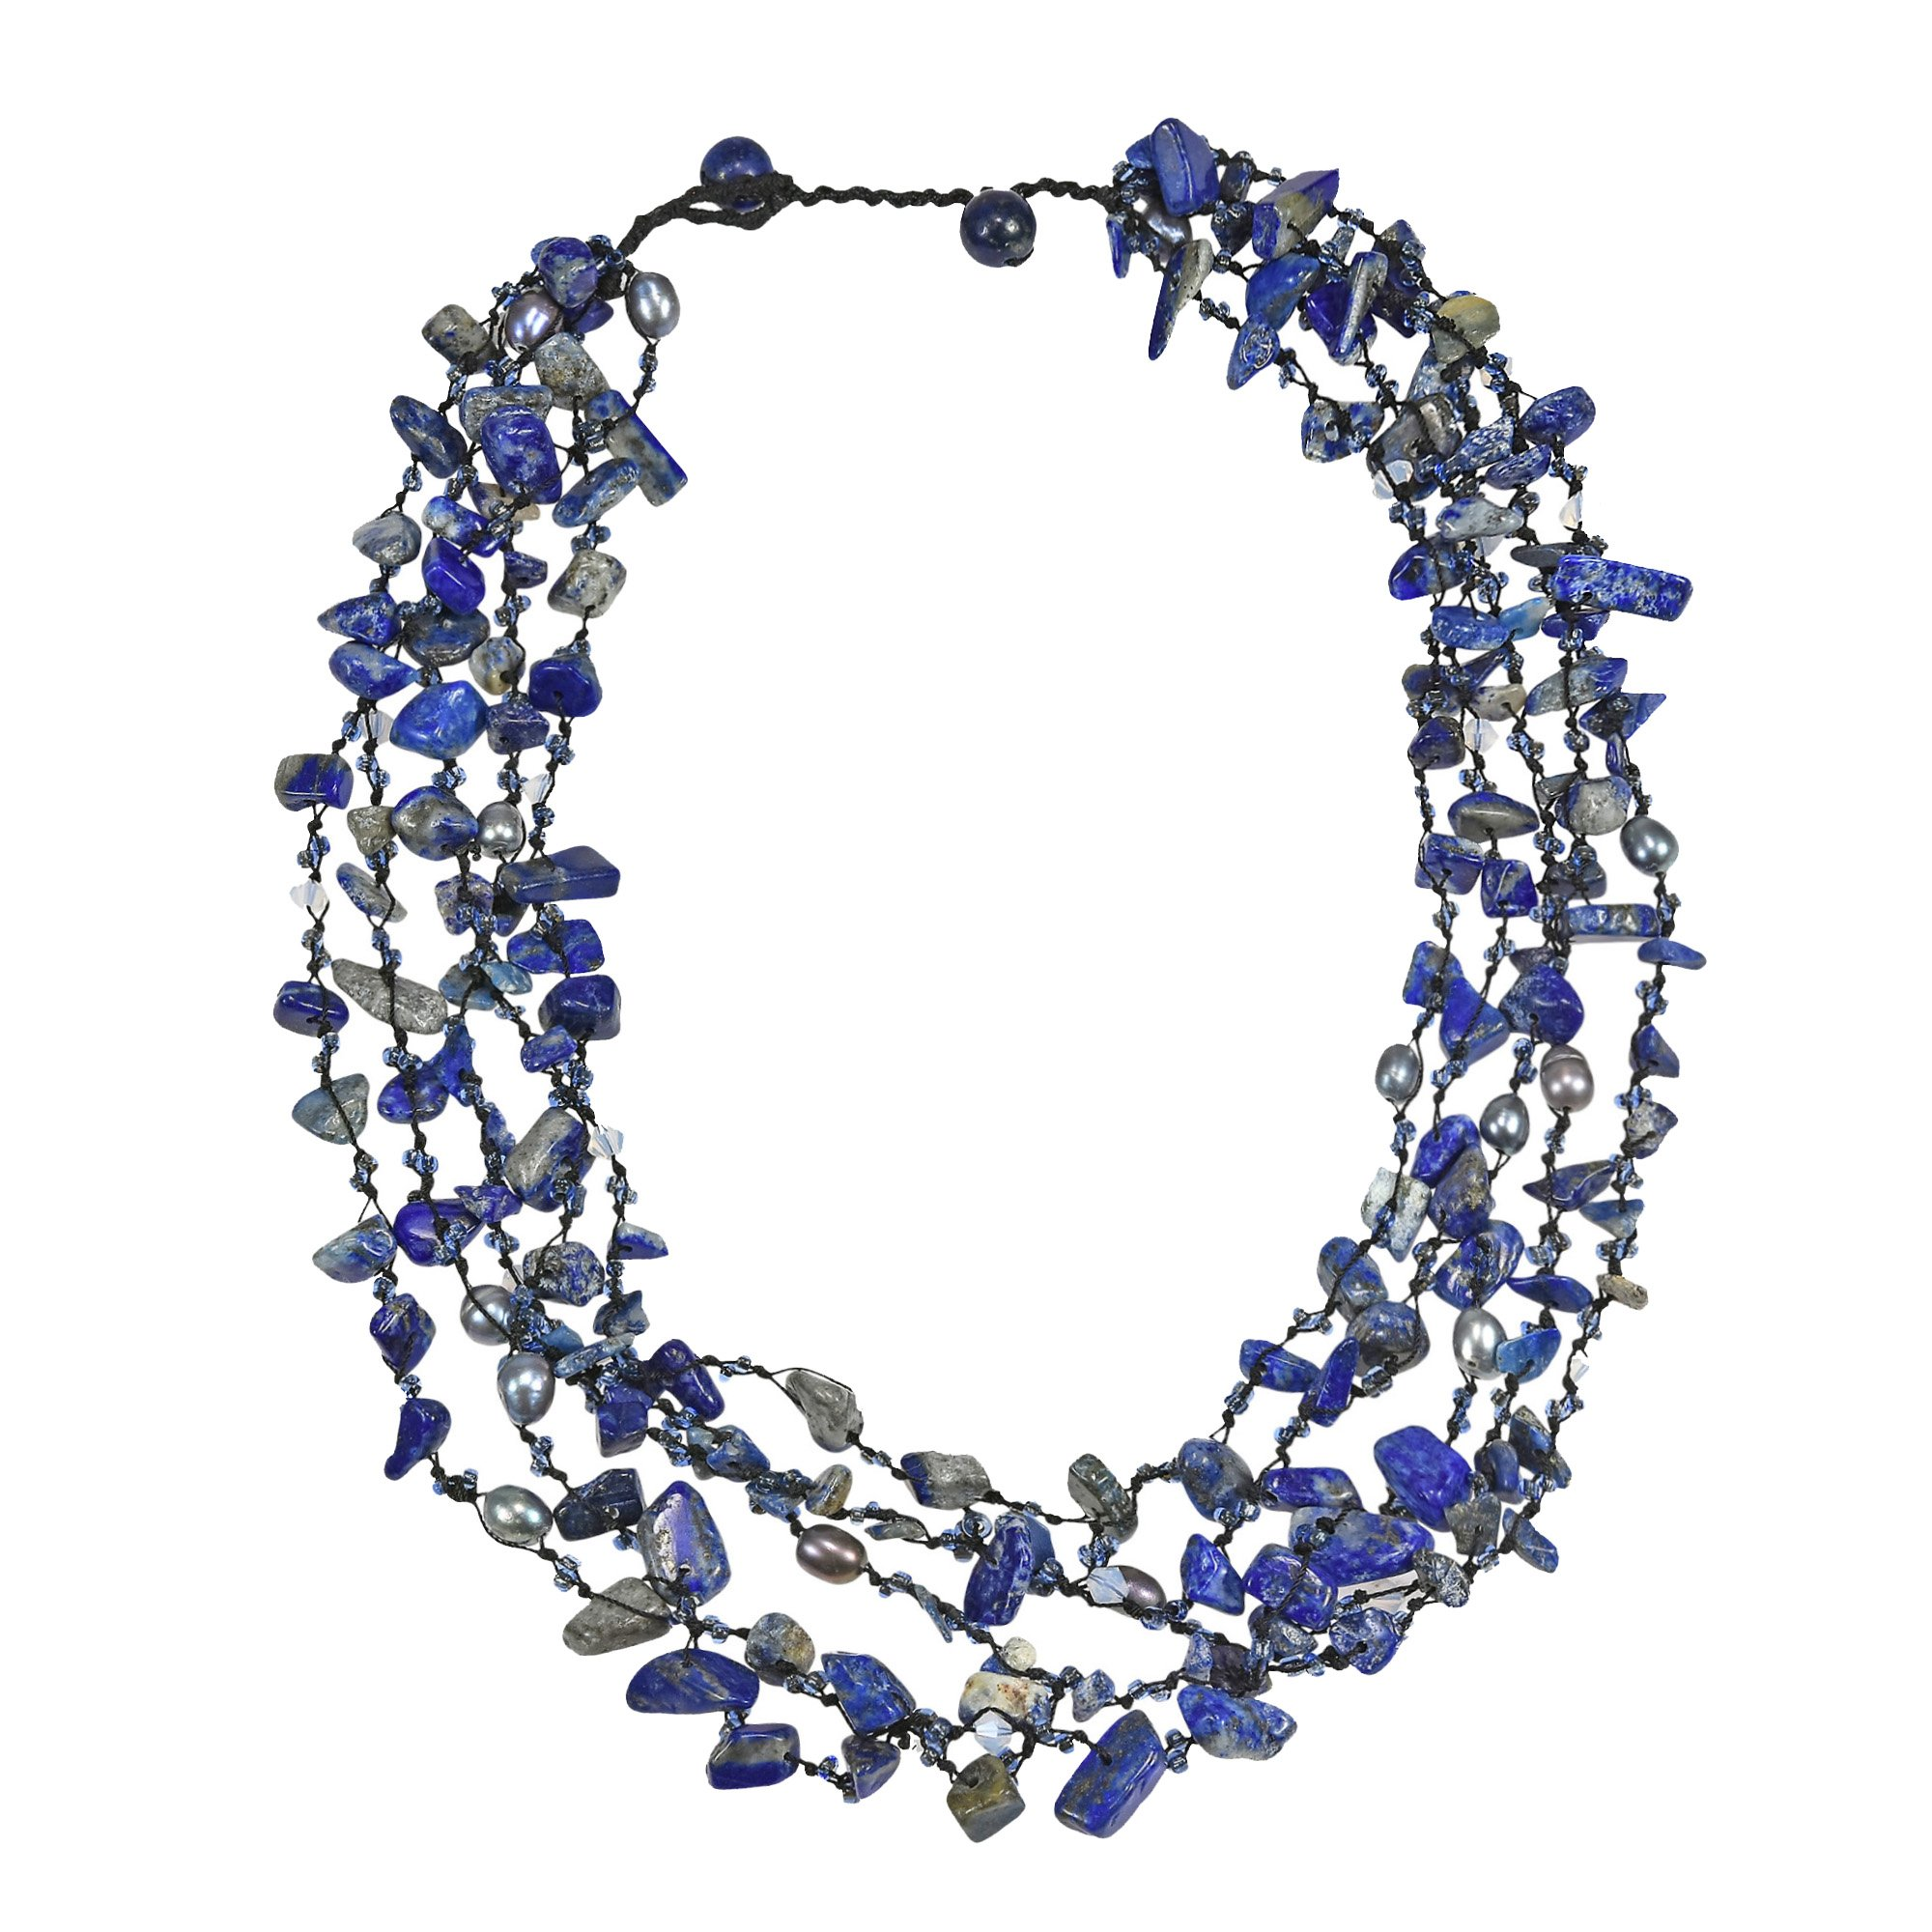 AeraVida Sea Simulated Blue Lapis-Lazuli Five-Layer Beauty Cotton Wax Rope Strand Necklace